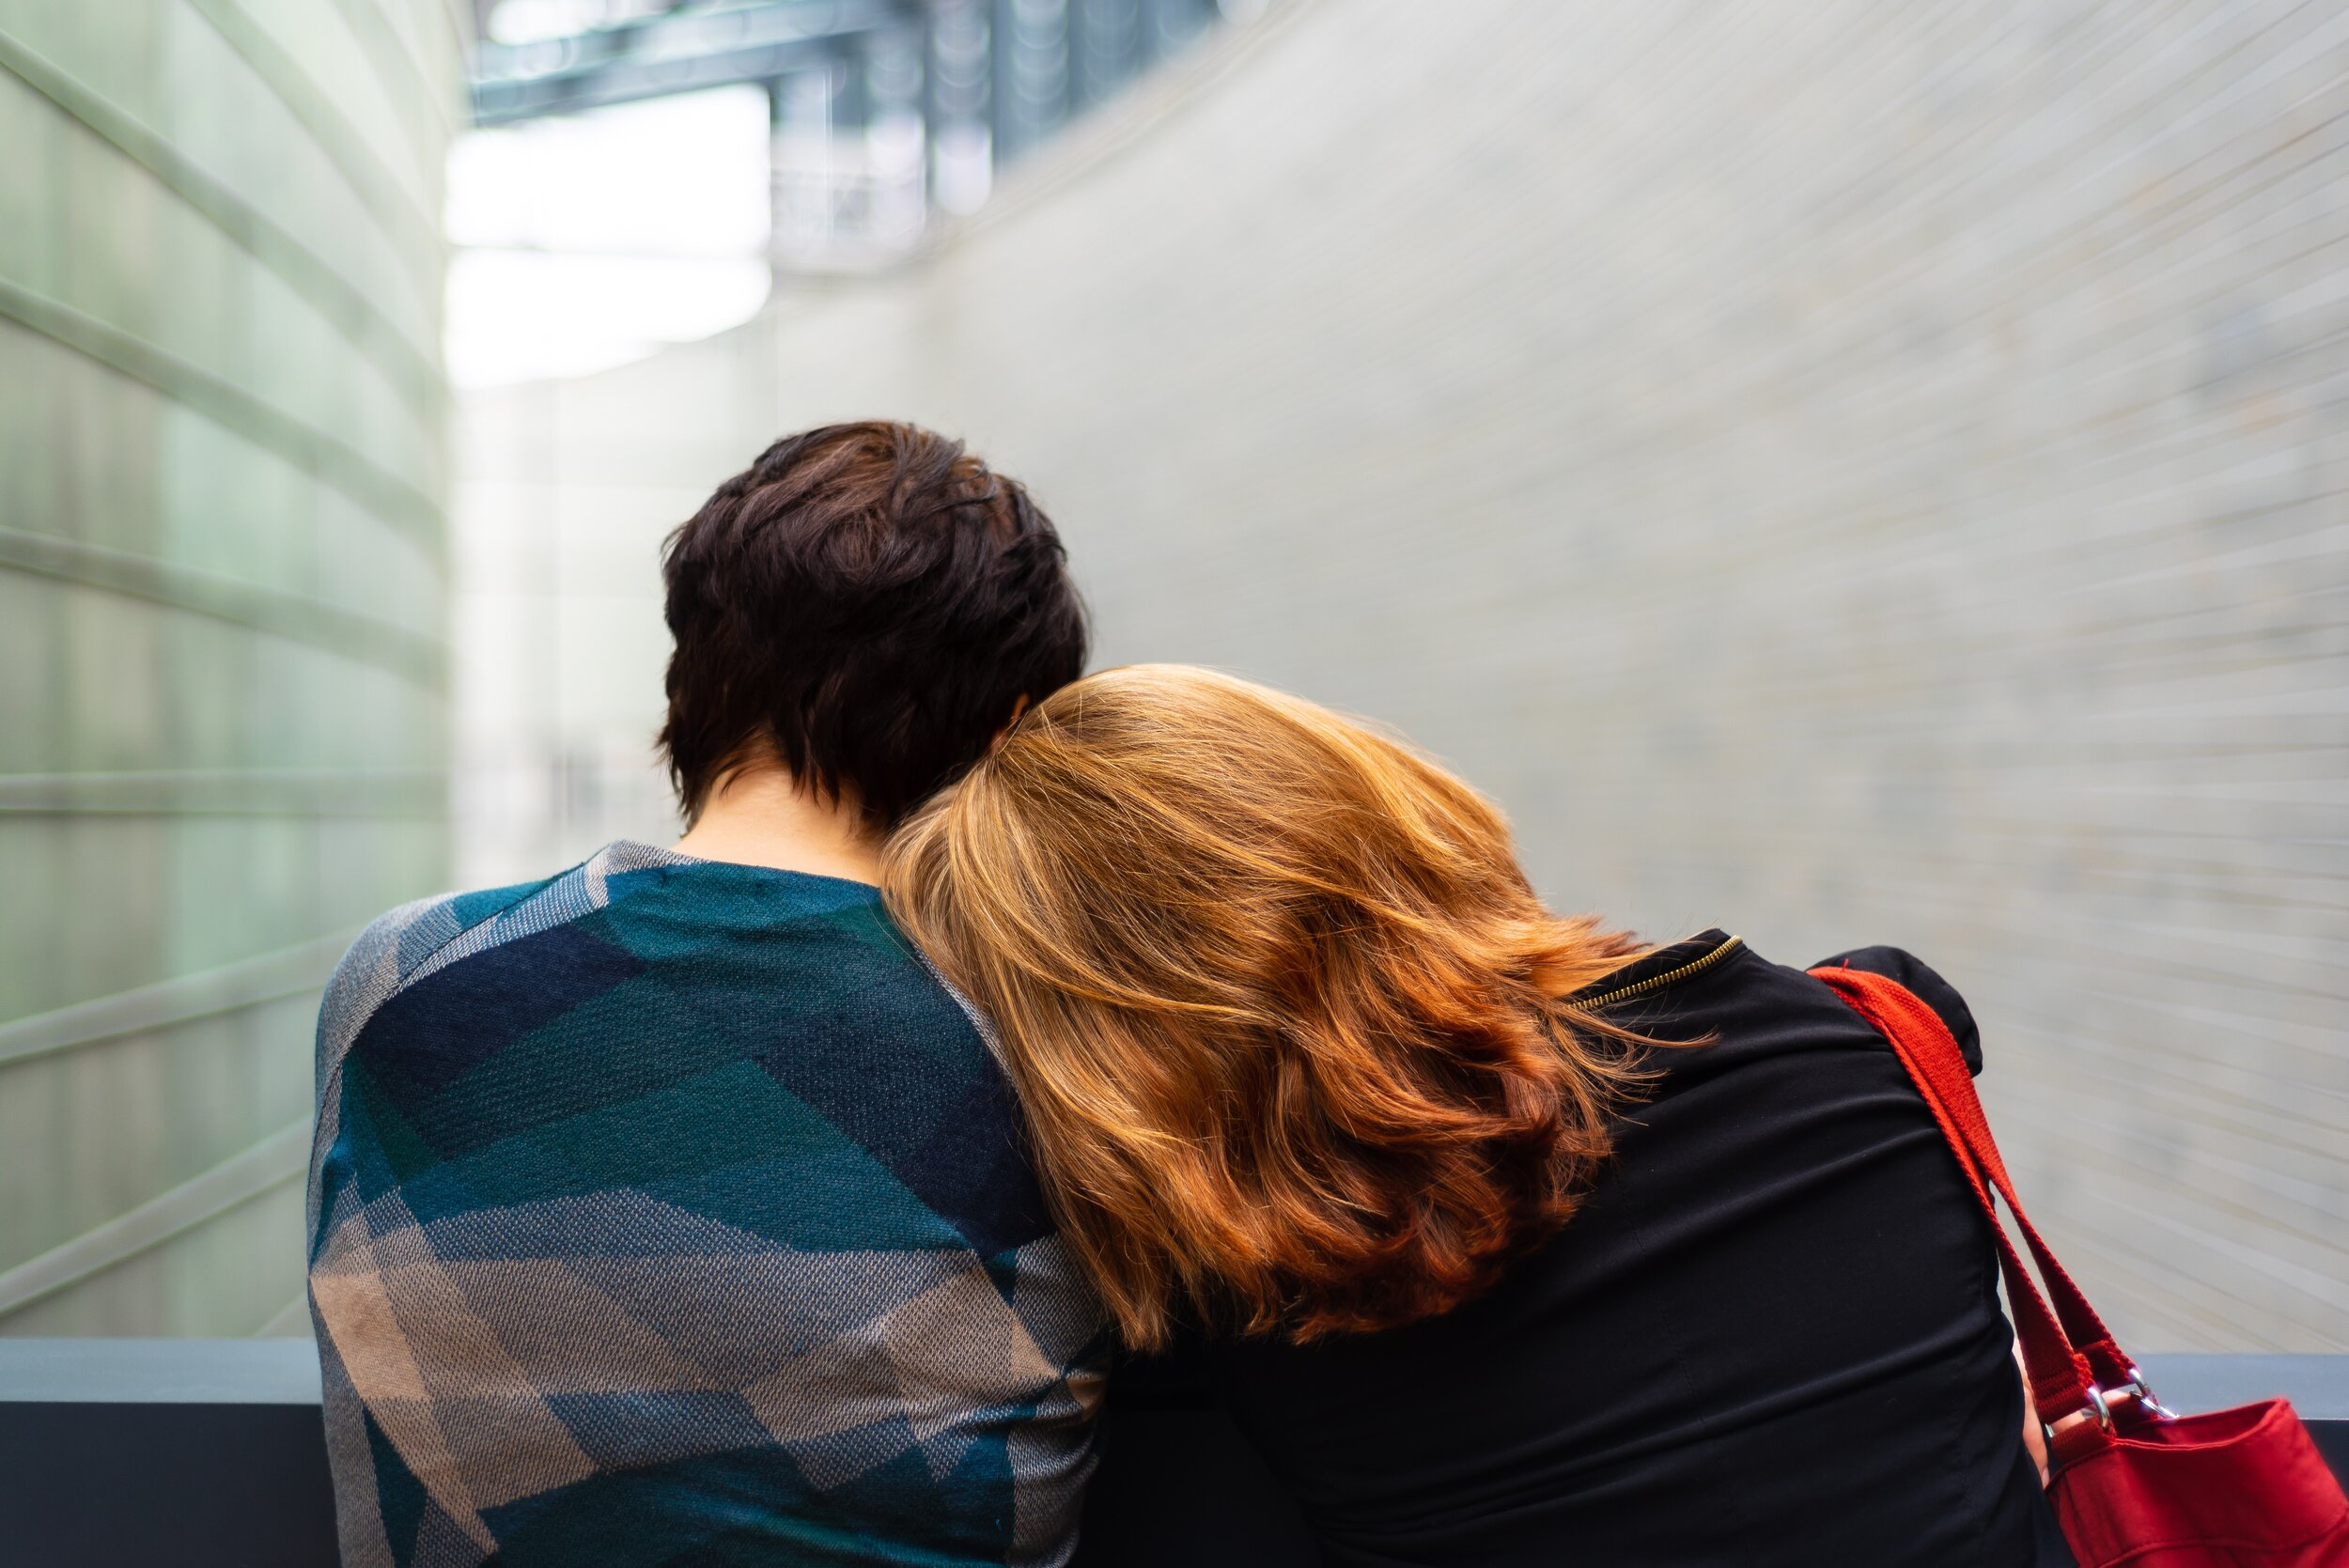 couple-unsplash.jpg